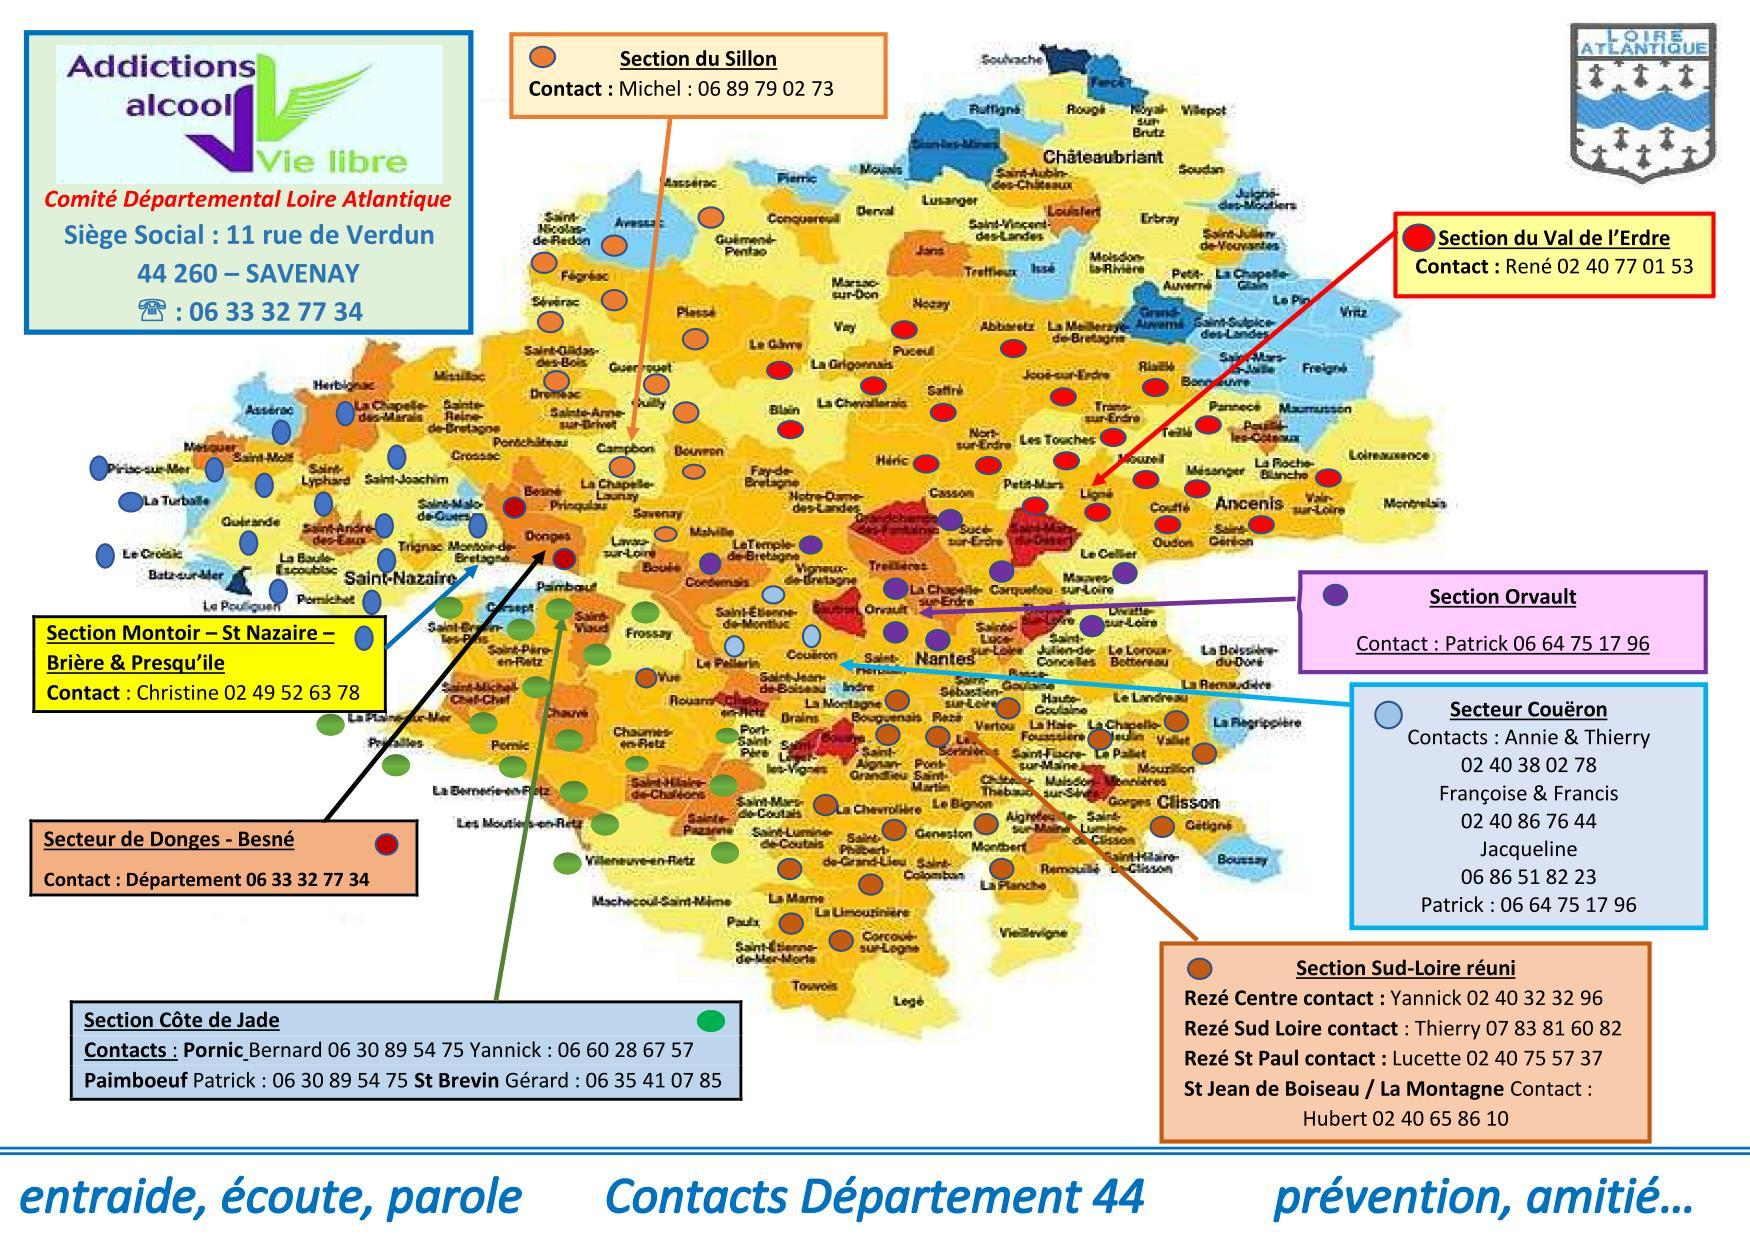 Carte contacts departement 44 finalisation